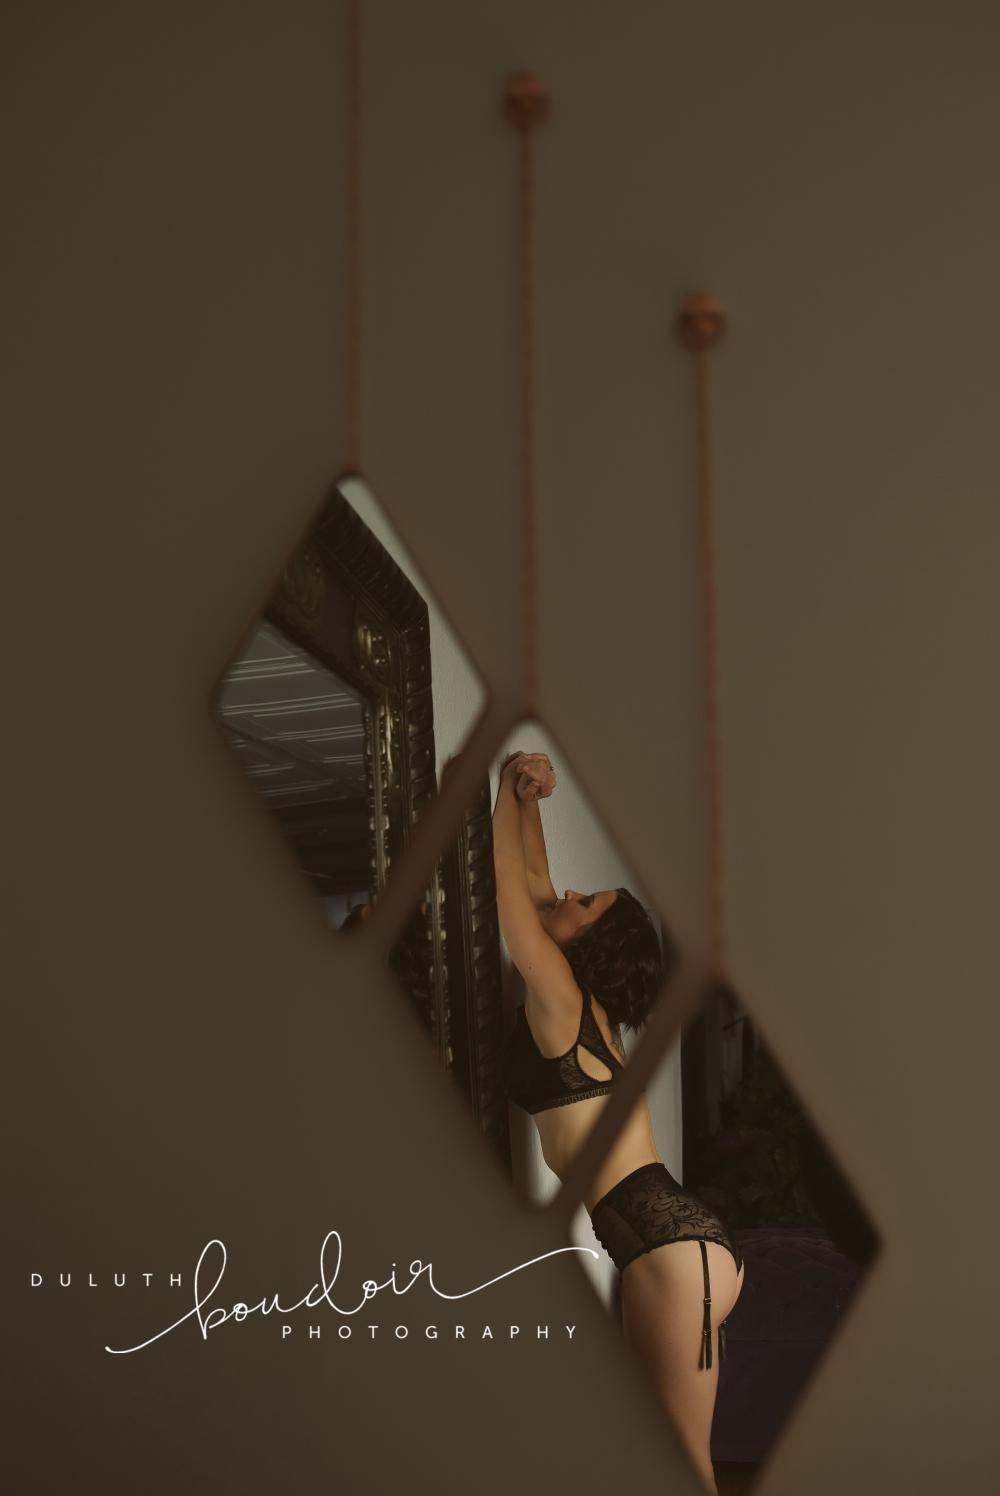 duluth_boudoir_photography_amity_15